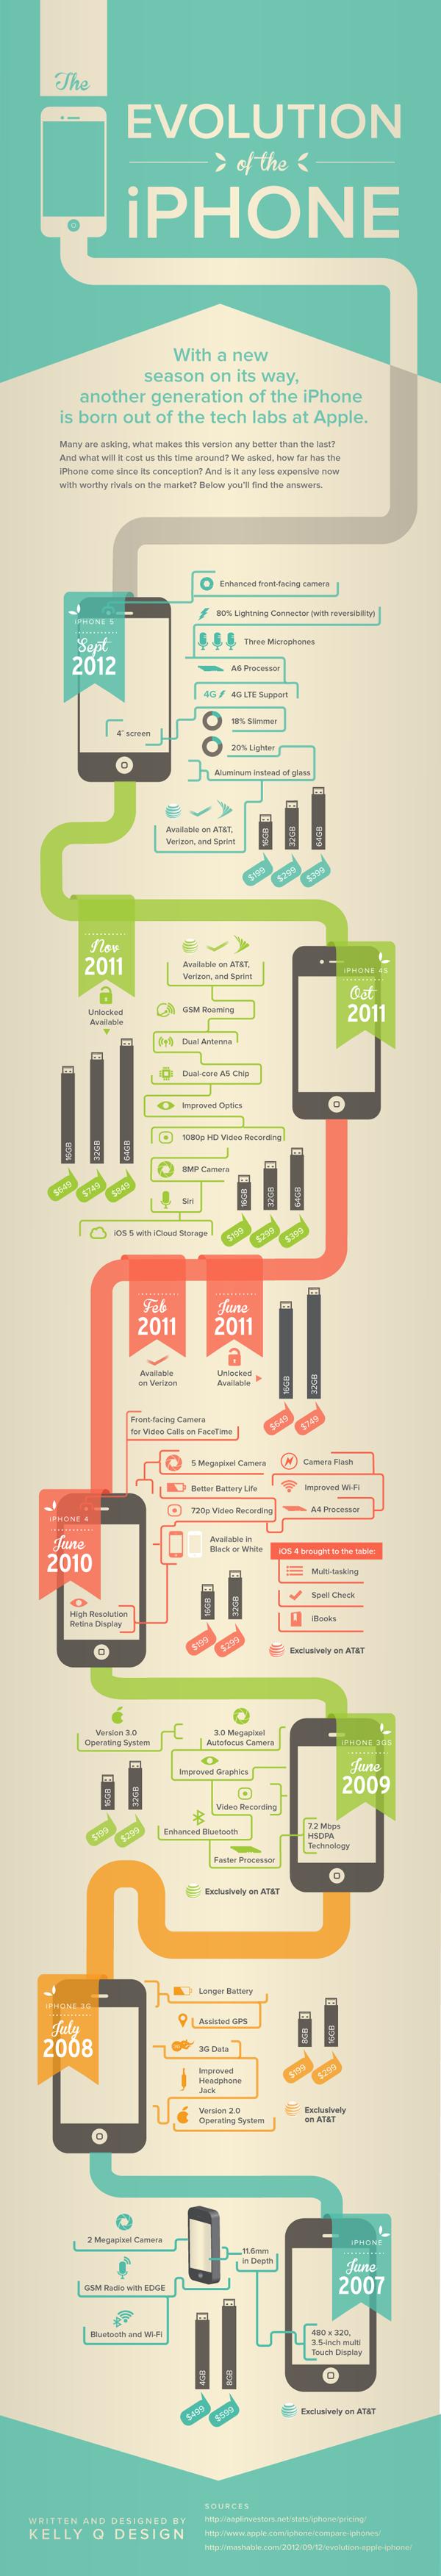 Interessante Grafik zur Entwicklung des iPhones-evolution-iphone-infographic.png